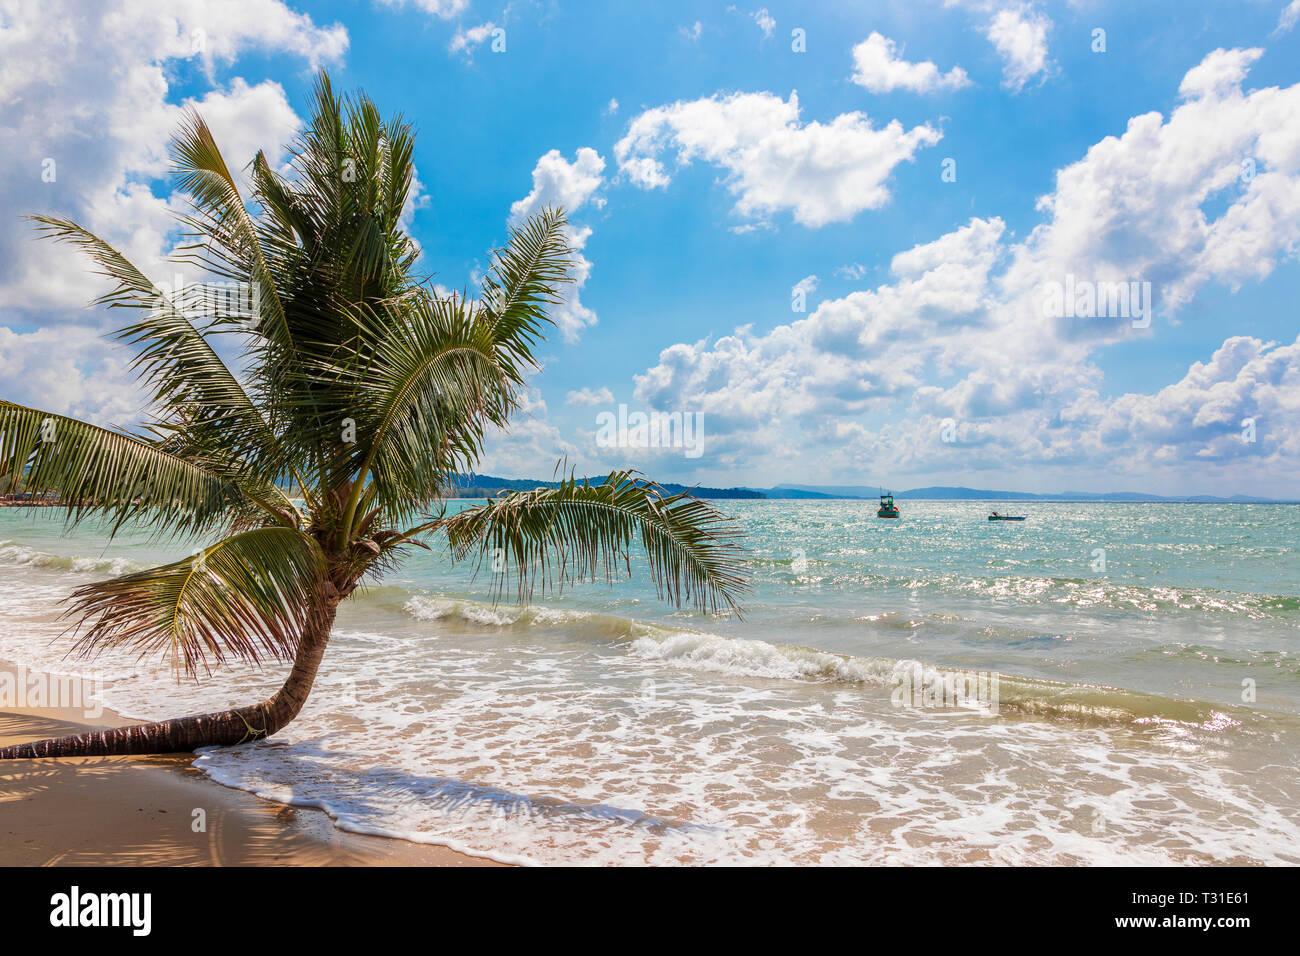 Beach scene at Bai Vung Bau, public beach Phu Quoc Island, Vietnam overlooking the Gulf of Thailand - Stock Image